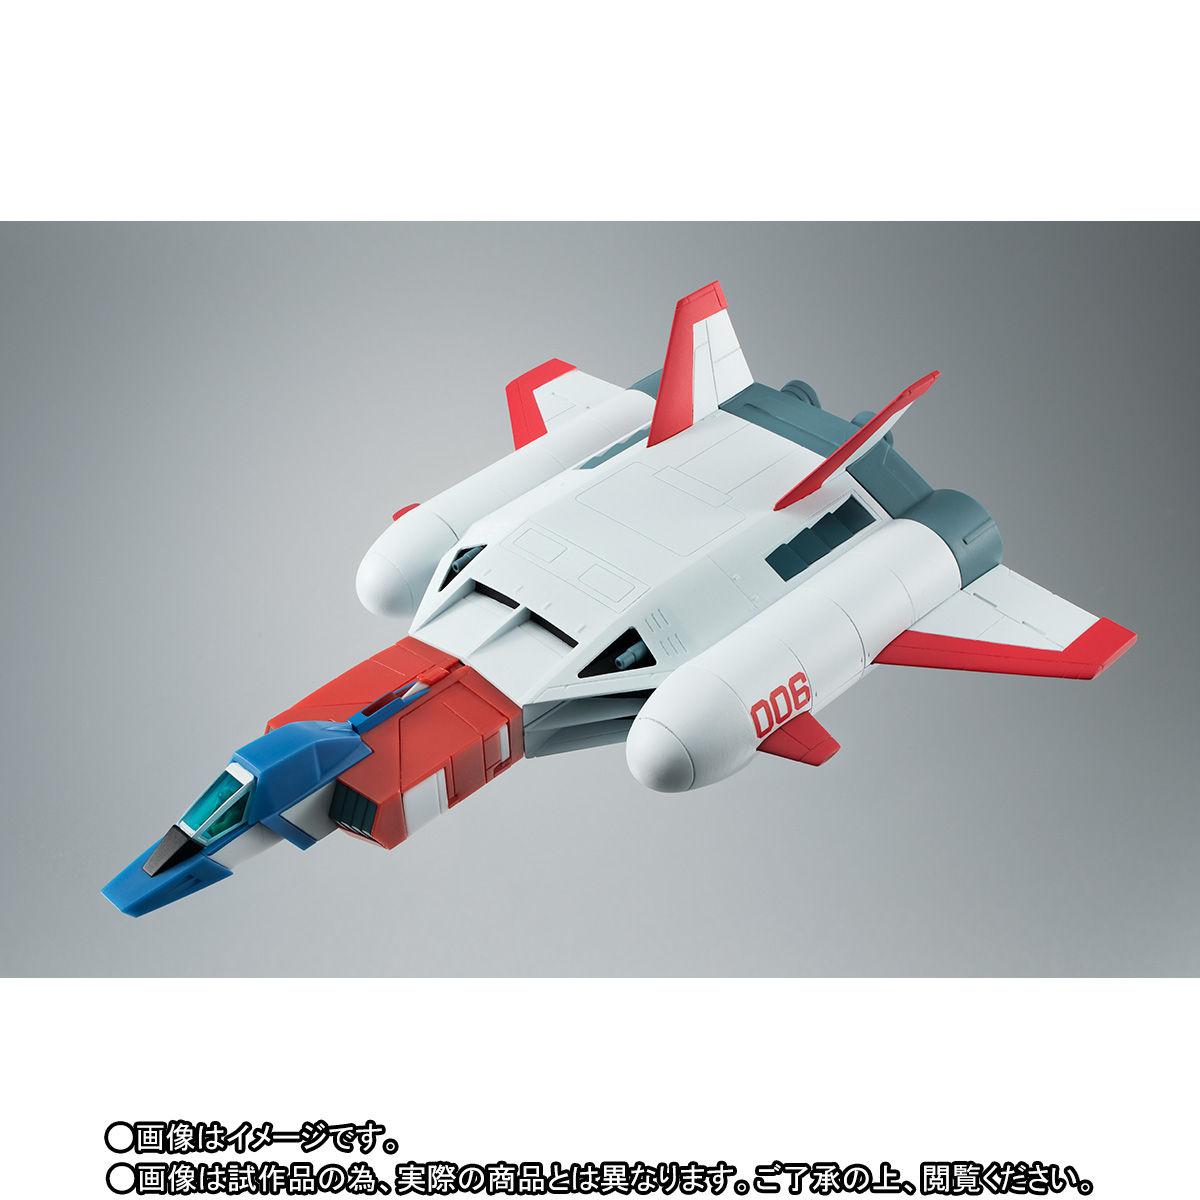 ROBOT魂〈SIDE MS〉『FF-X7-Bst コア・ブースター 2機セット ver. A.N.I.M.E. ~スレッガー005 & セイラ006~』機動戦士ガンダム 可動フィギュア-007